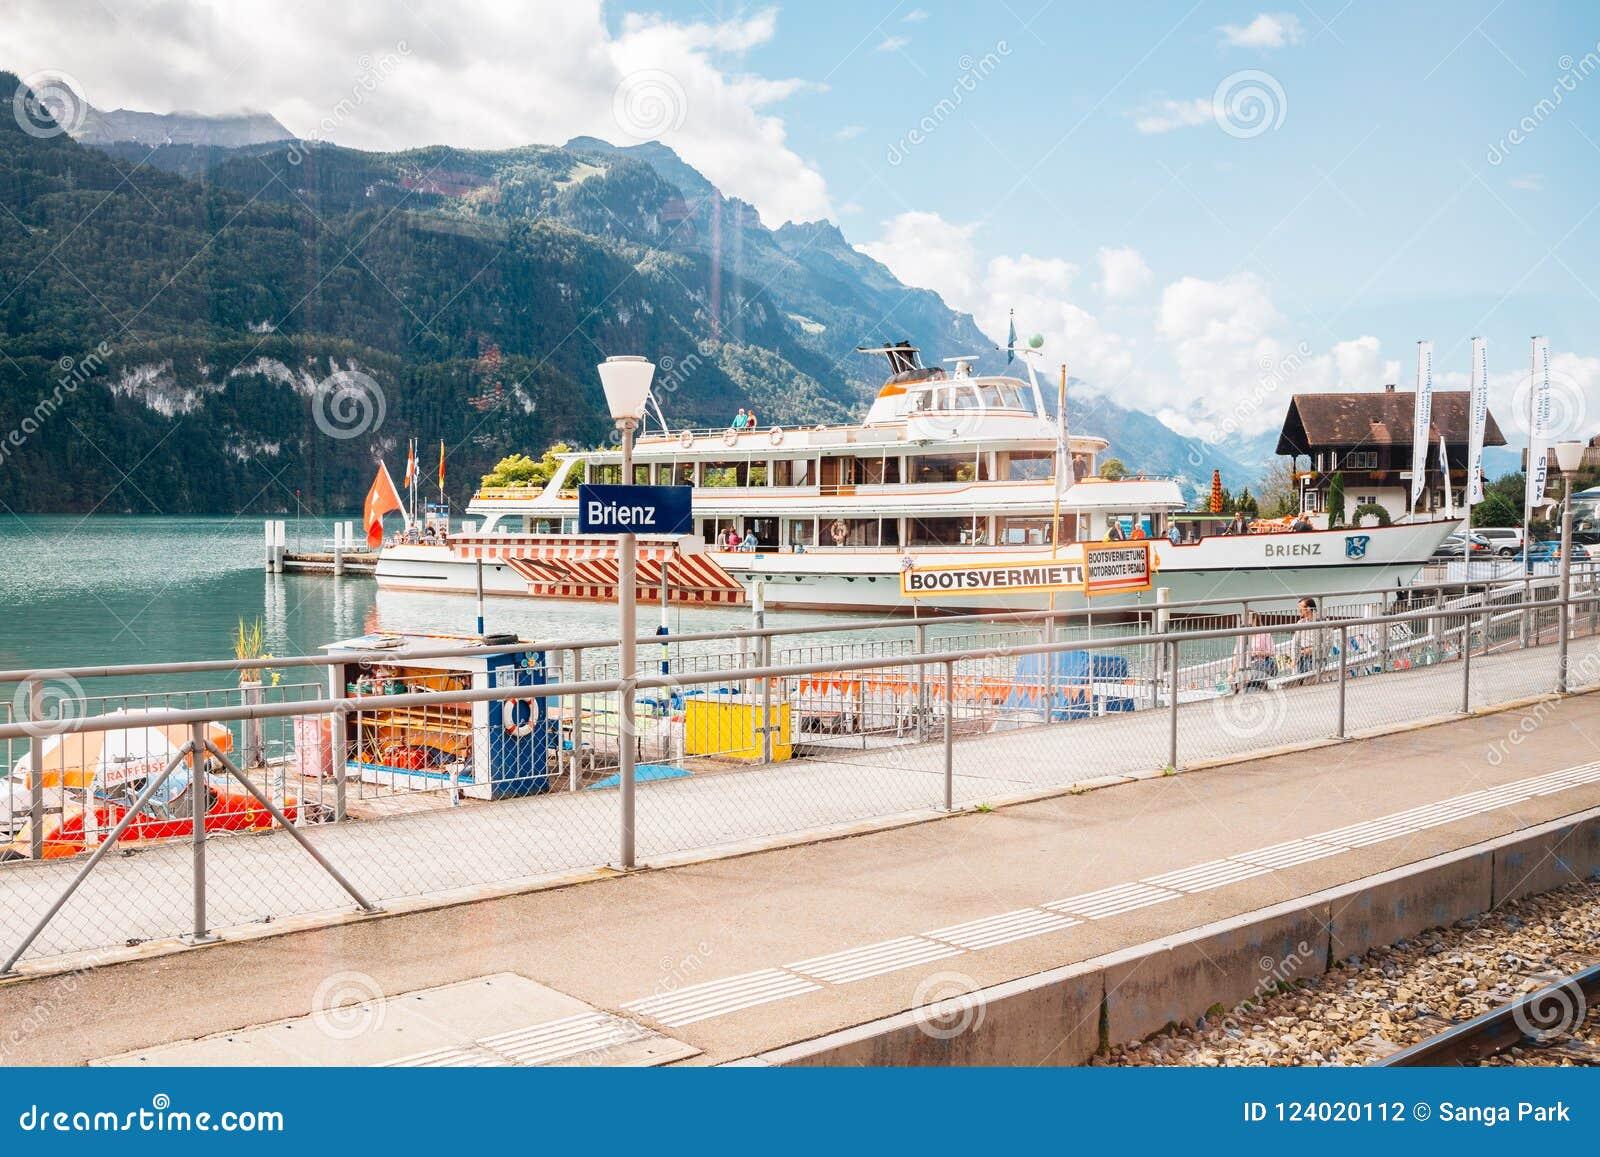 Brienz lake and cruise ship at Brienz railway station in Switzerland